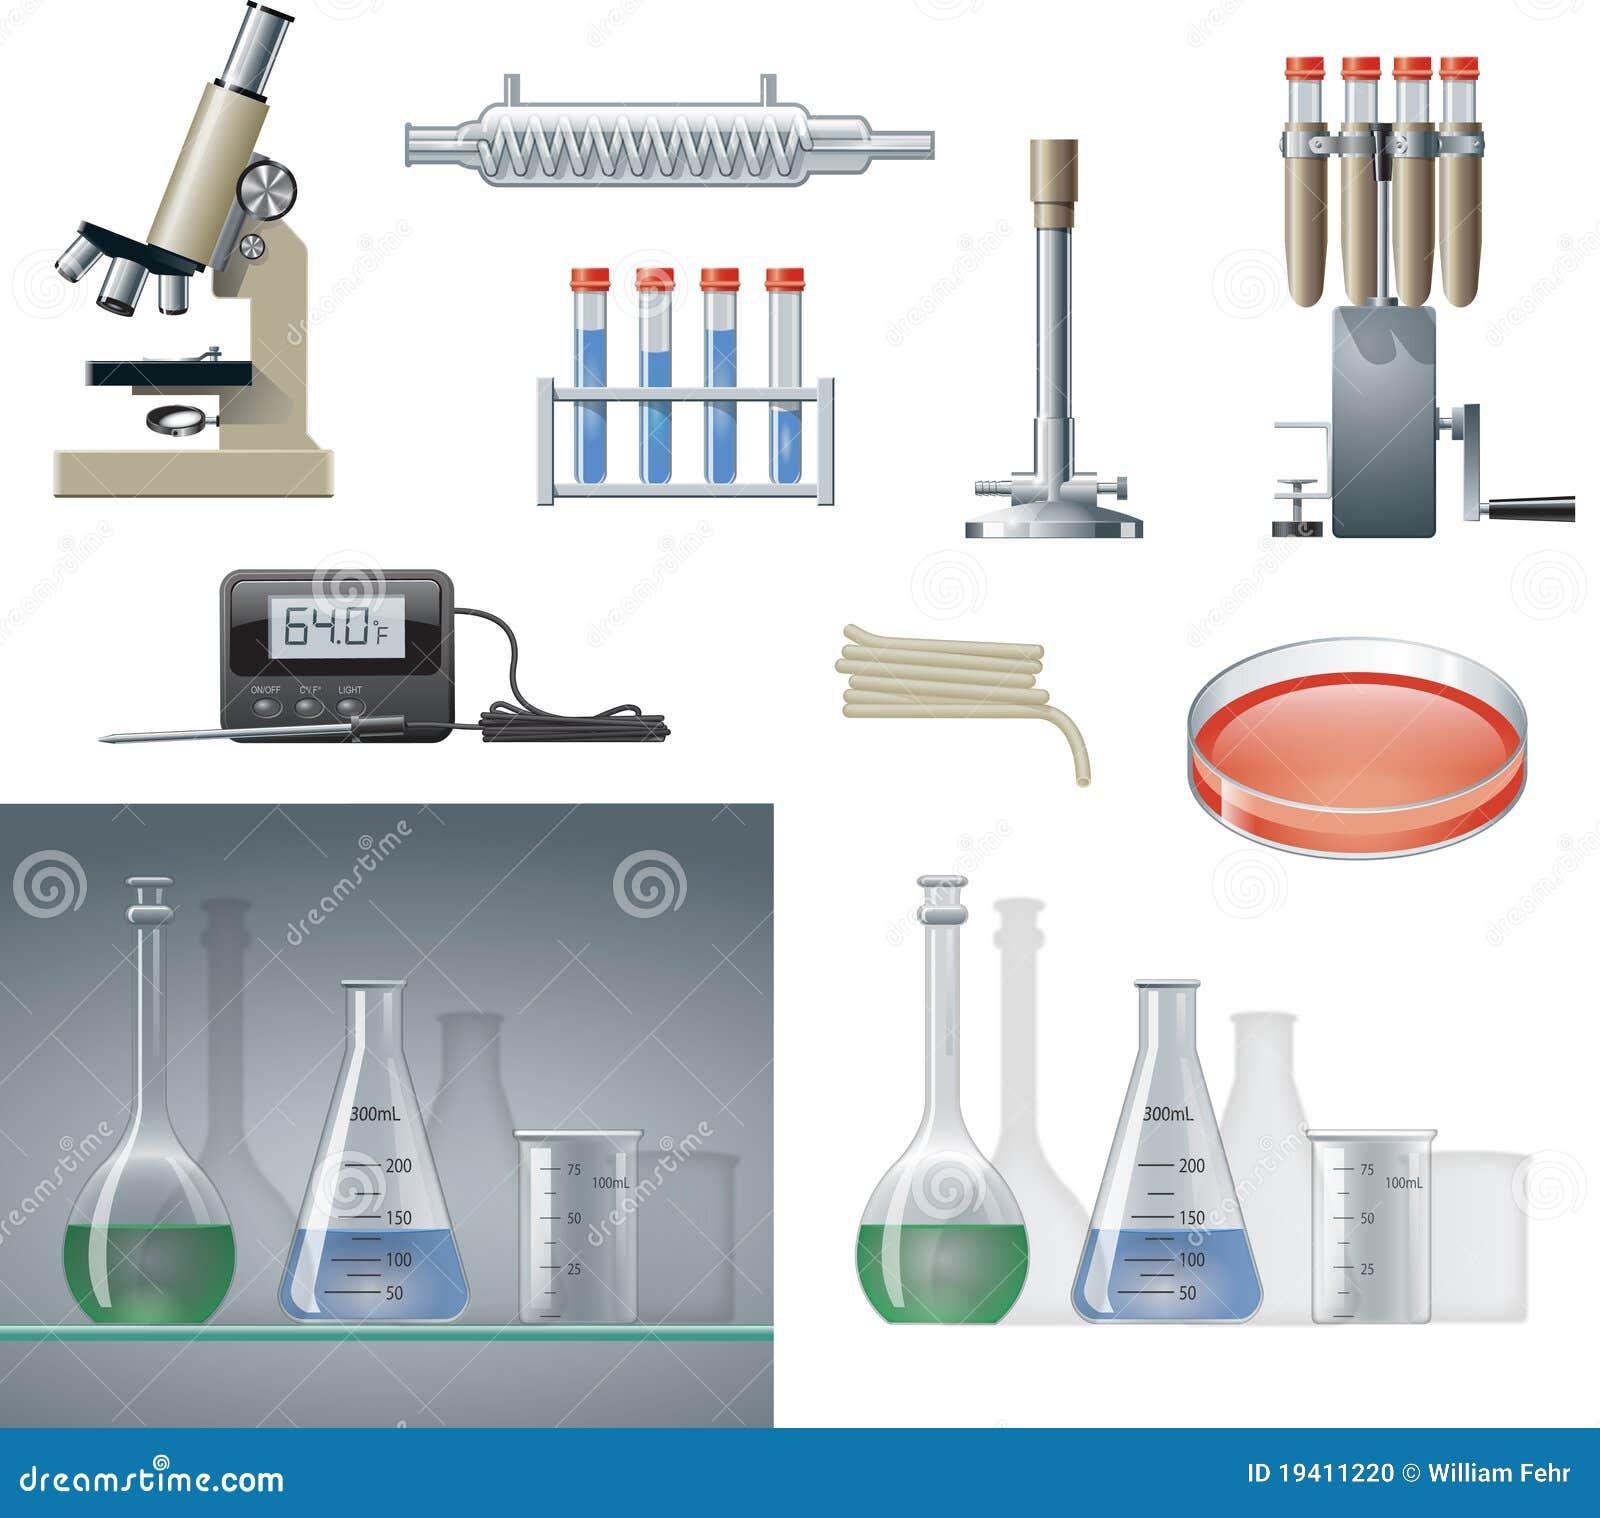 imagen equipo laboratorio: